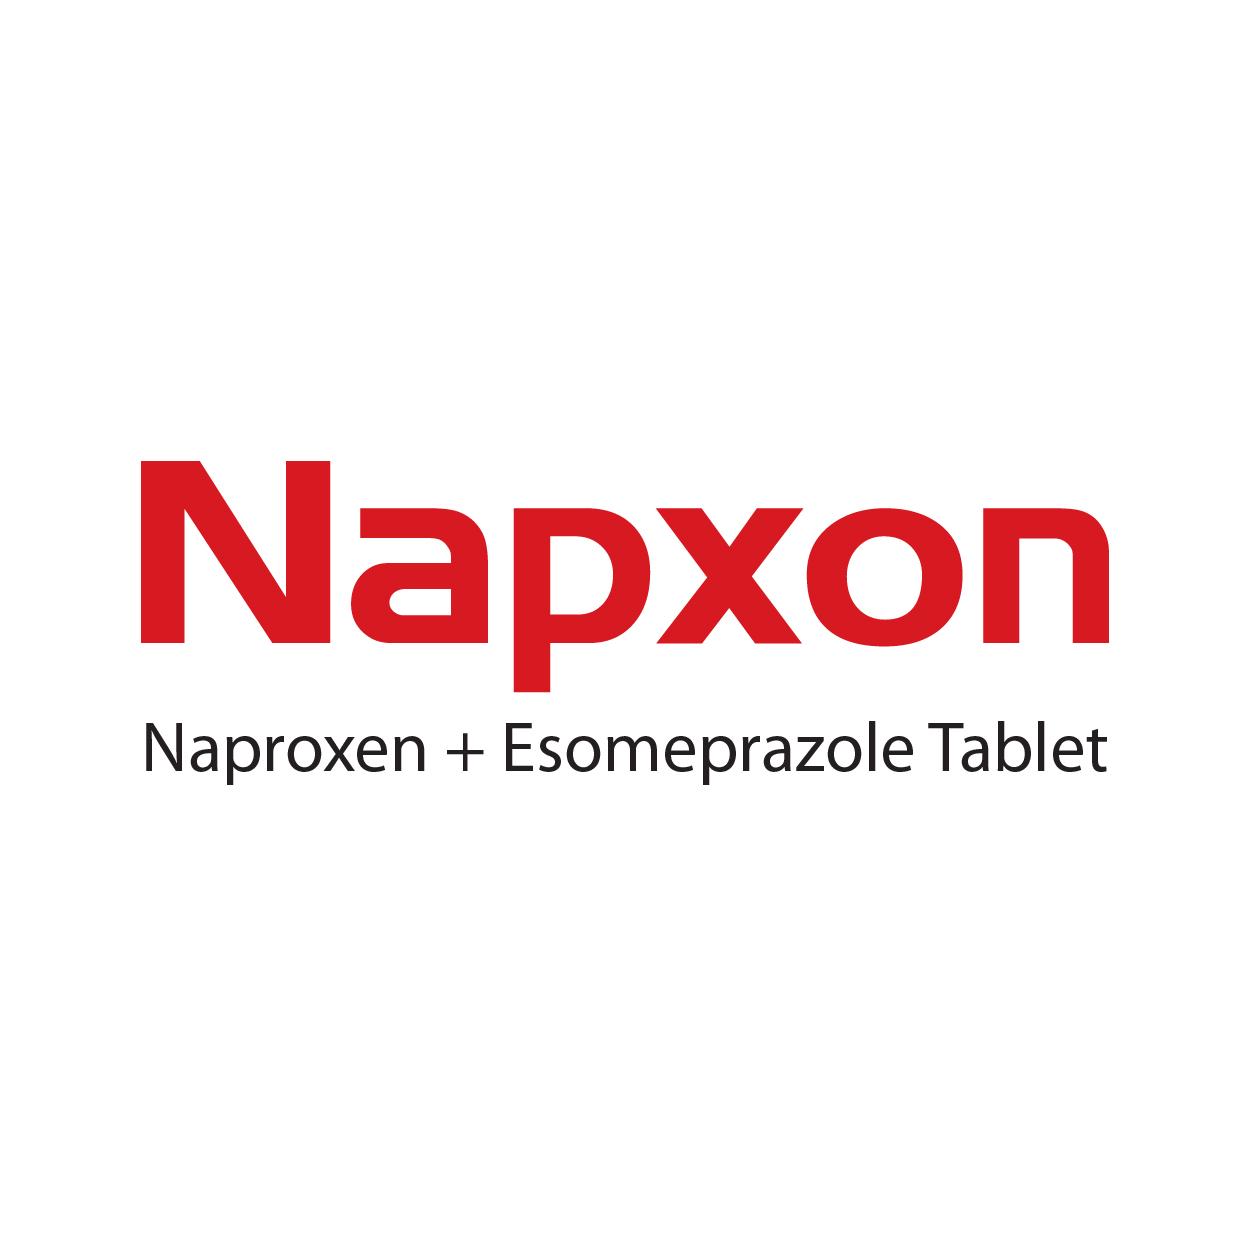 Napxon